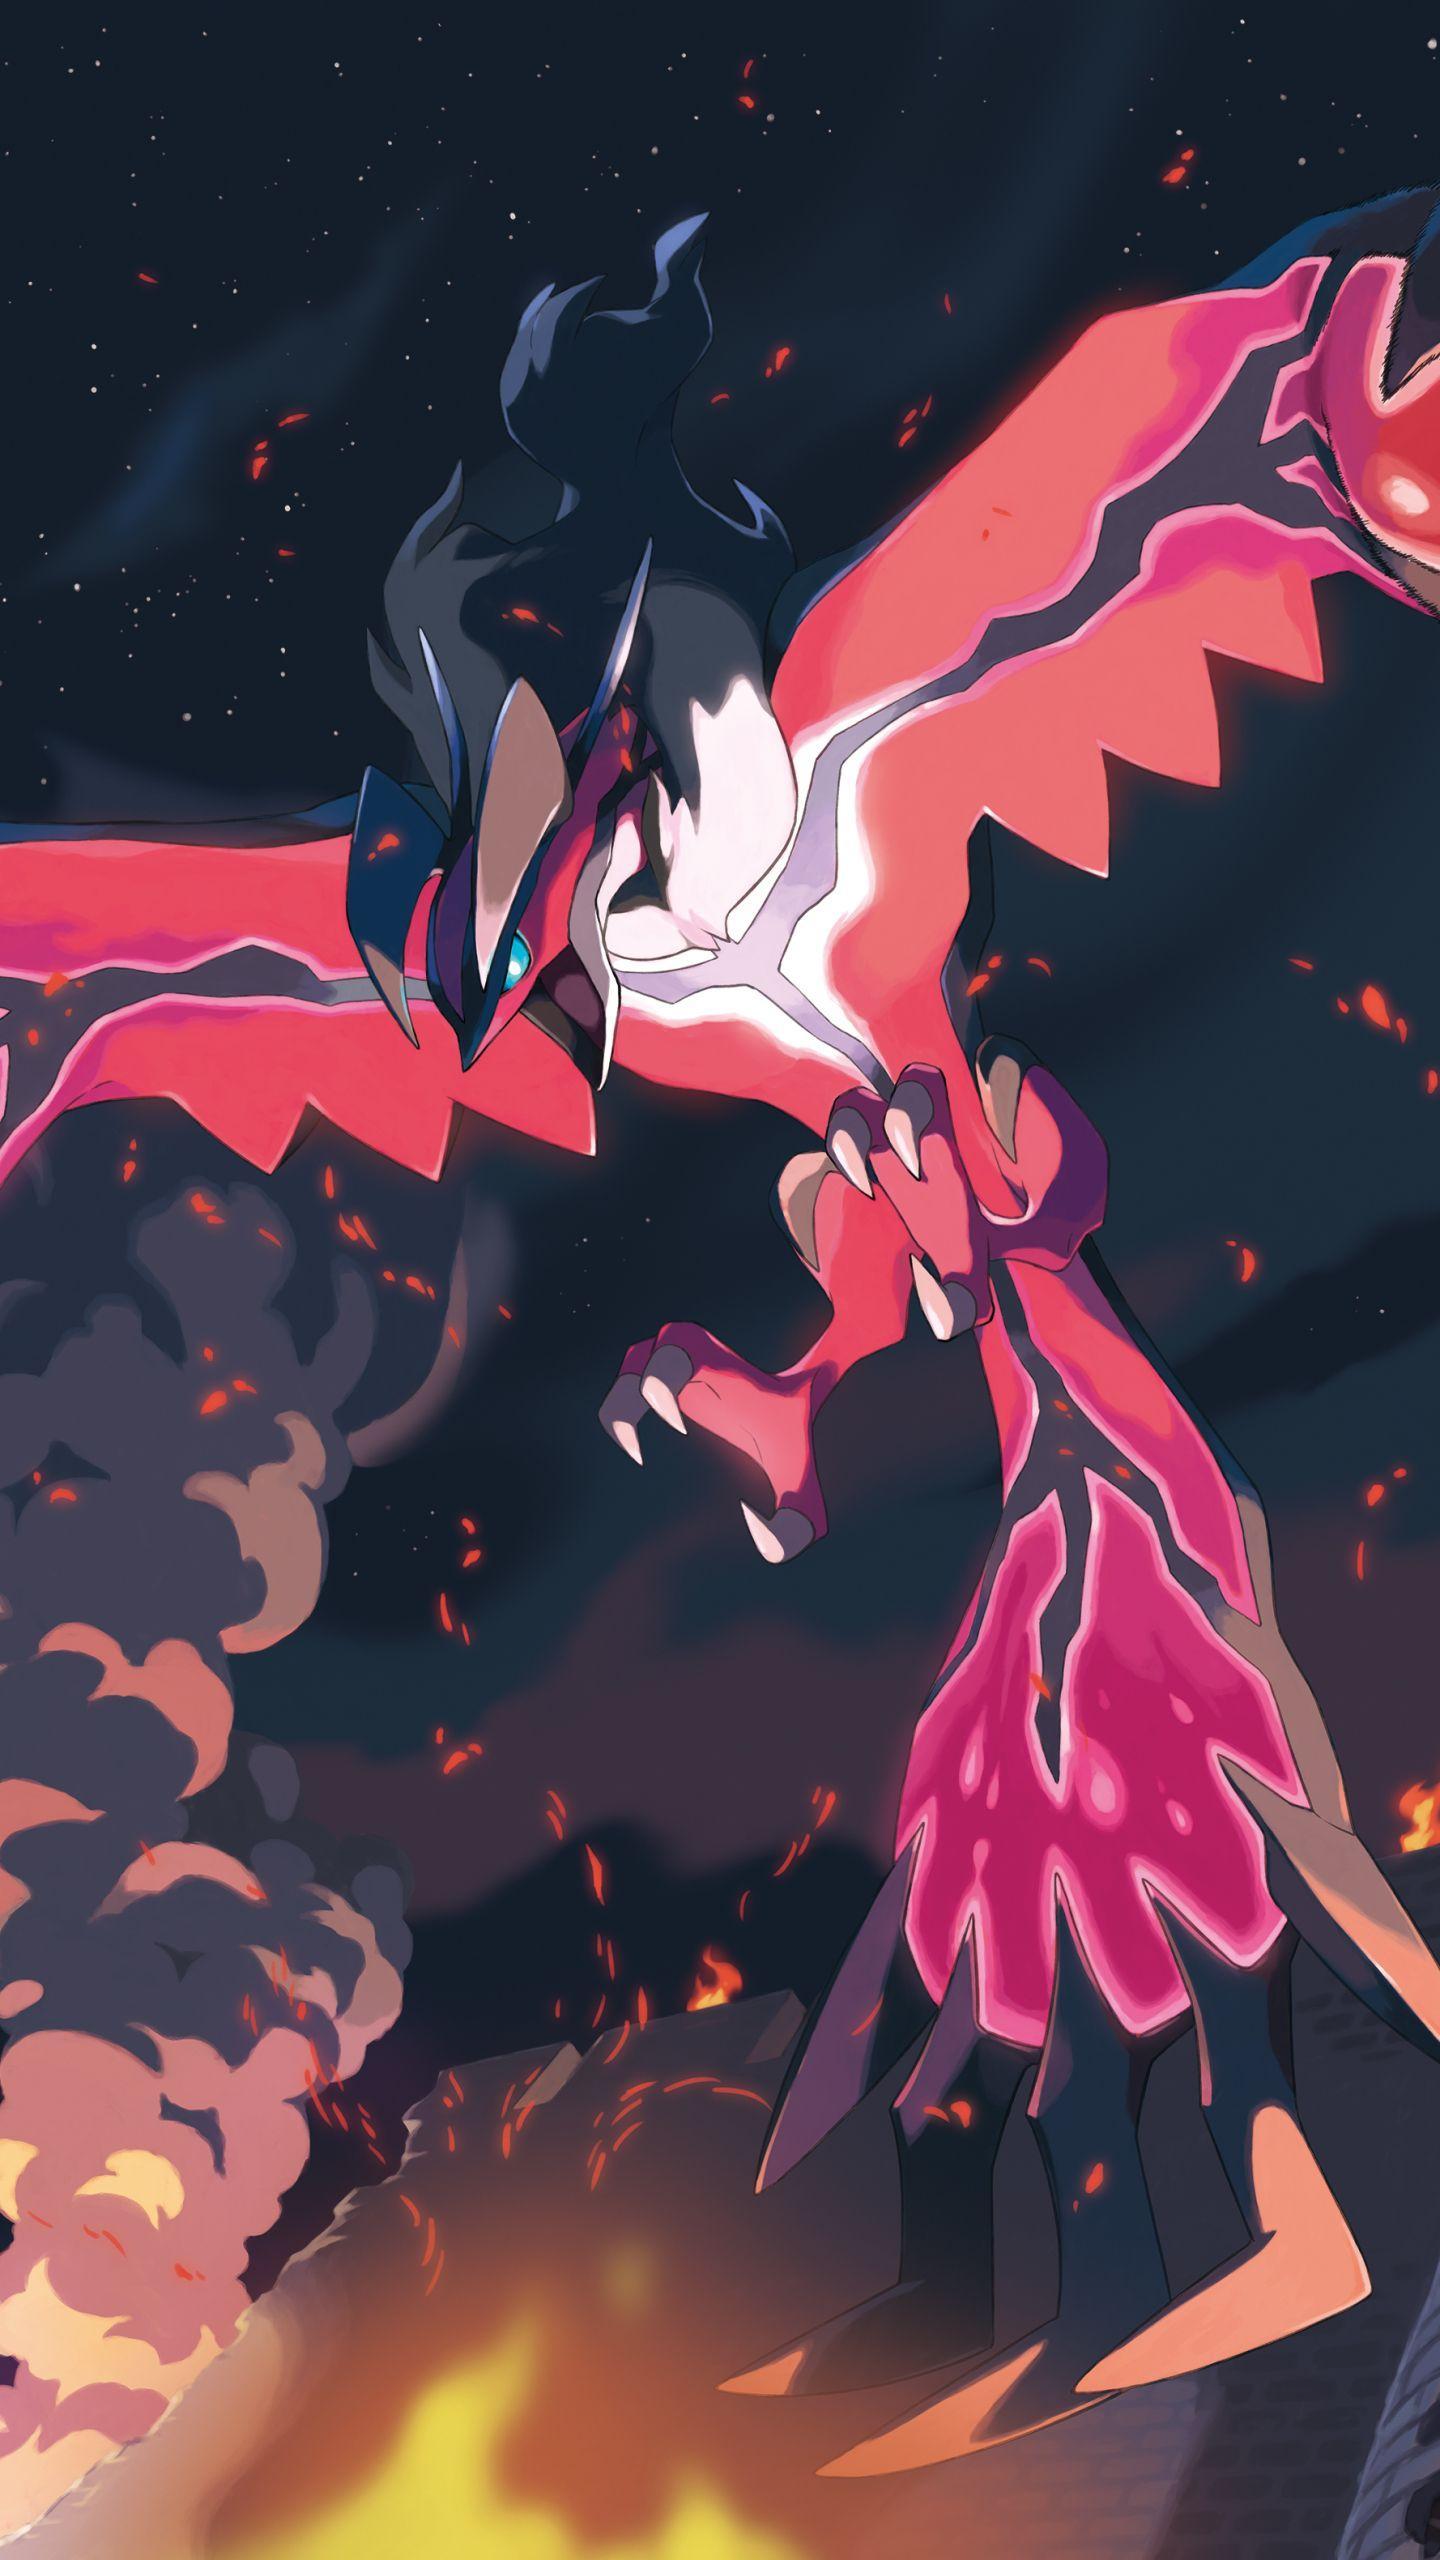 4K Pokemon Phone Wallpapers - Top Free 4K Pokemon Phone ...